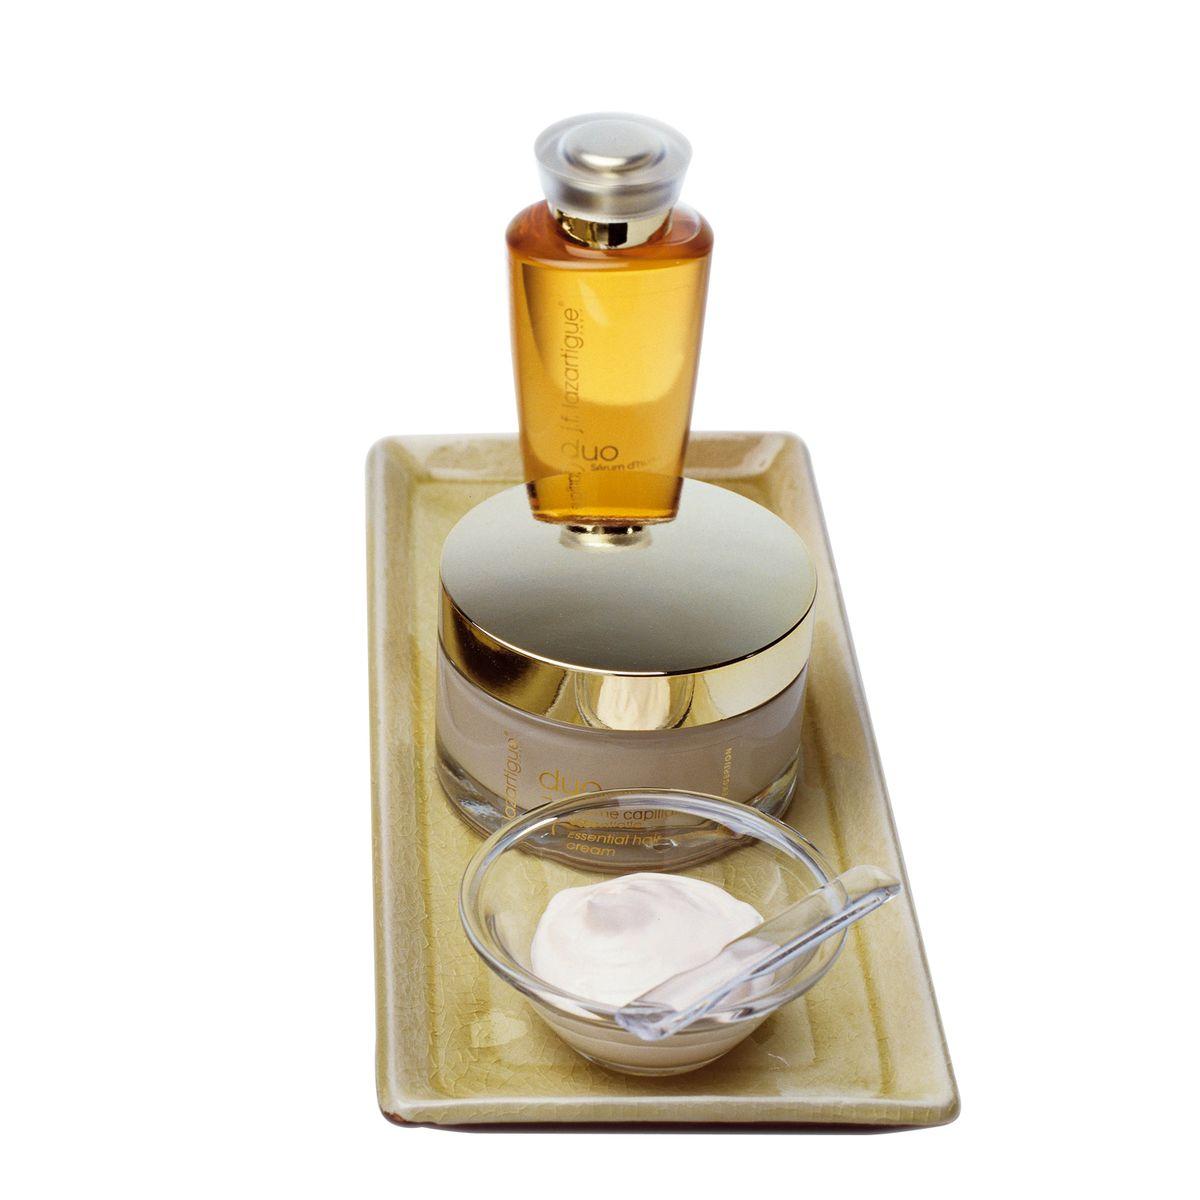 J.F.Lazartigue Набор Незаменимый дуэт КАМЕЛИЯ: Эссенциальный крем для волос (Essential Hair Cream),200 мл + Масляная сыворотка Камелия (Tea Oil Delicate Serum) 100 мл